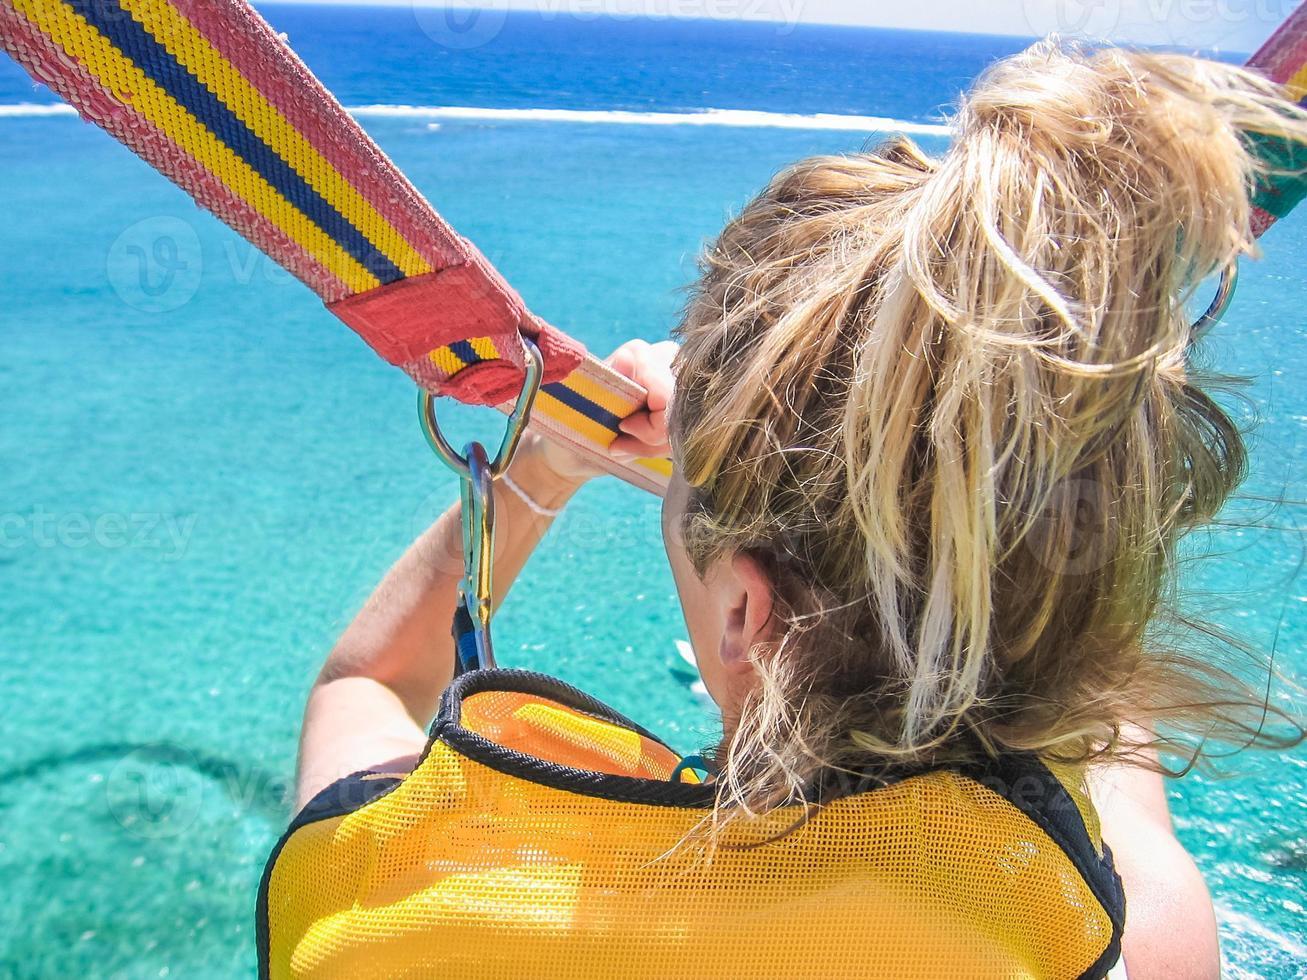 kvinna parasailing foto